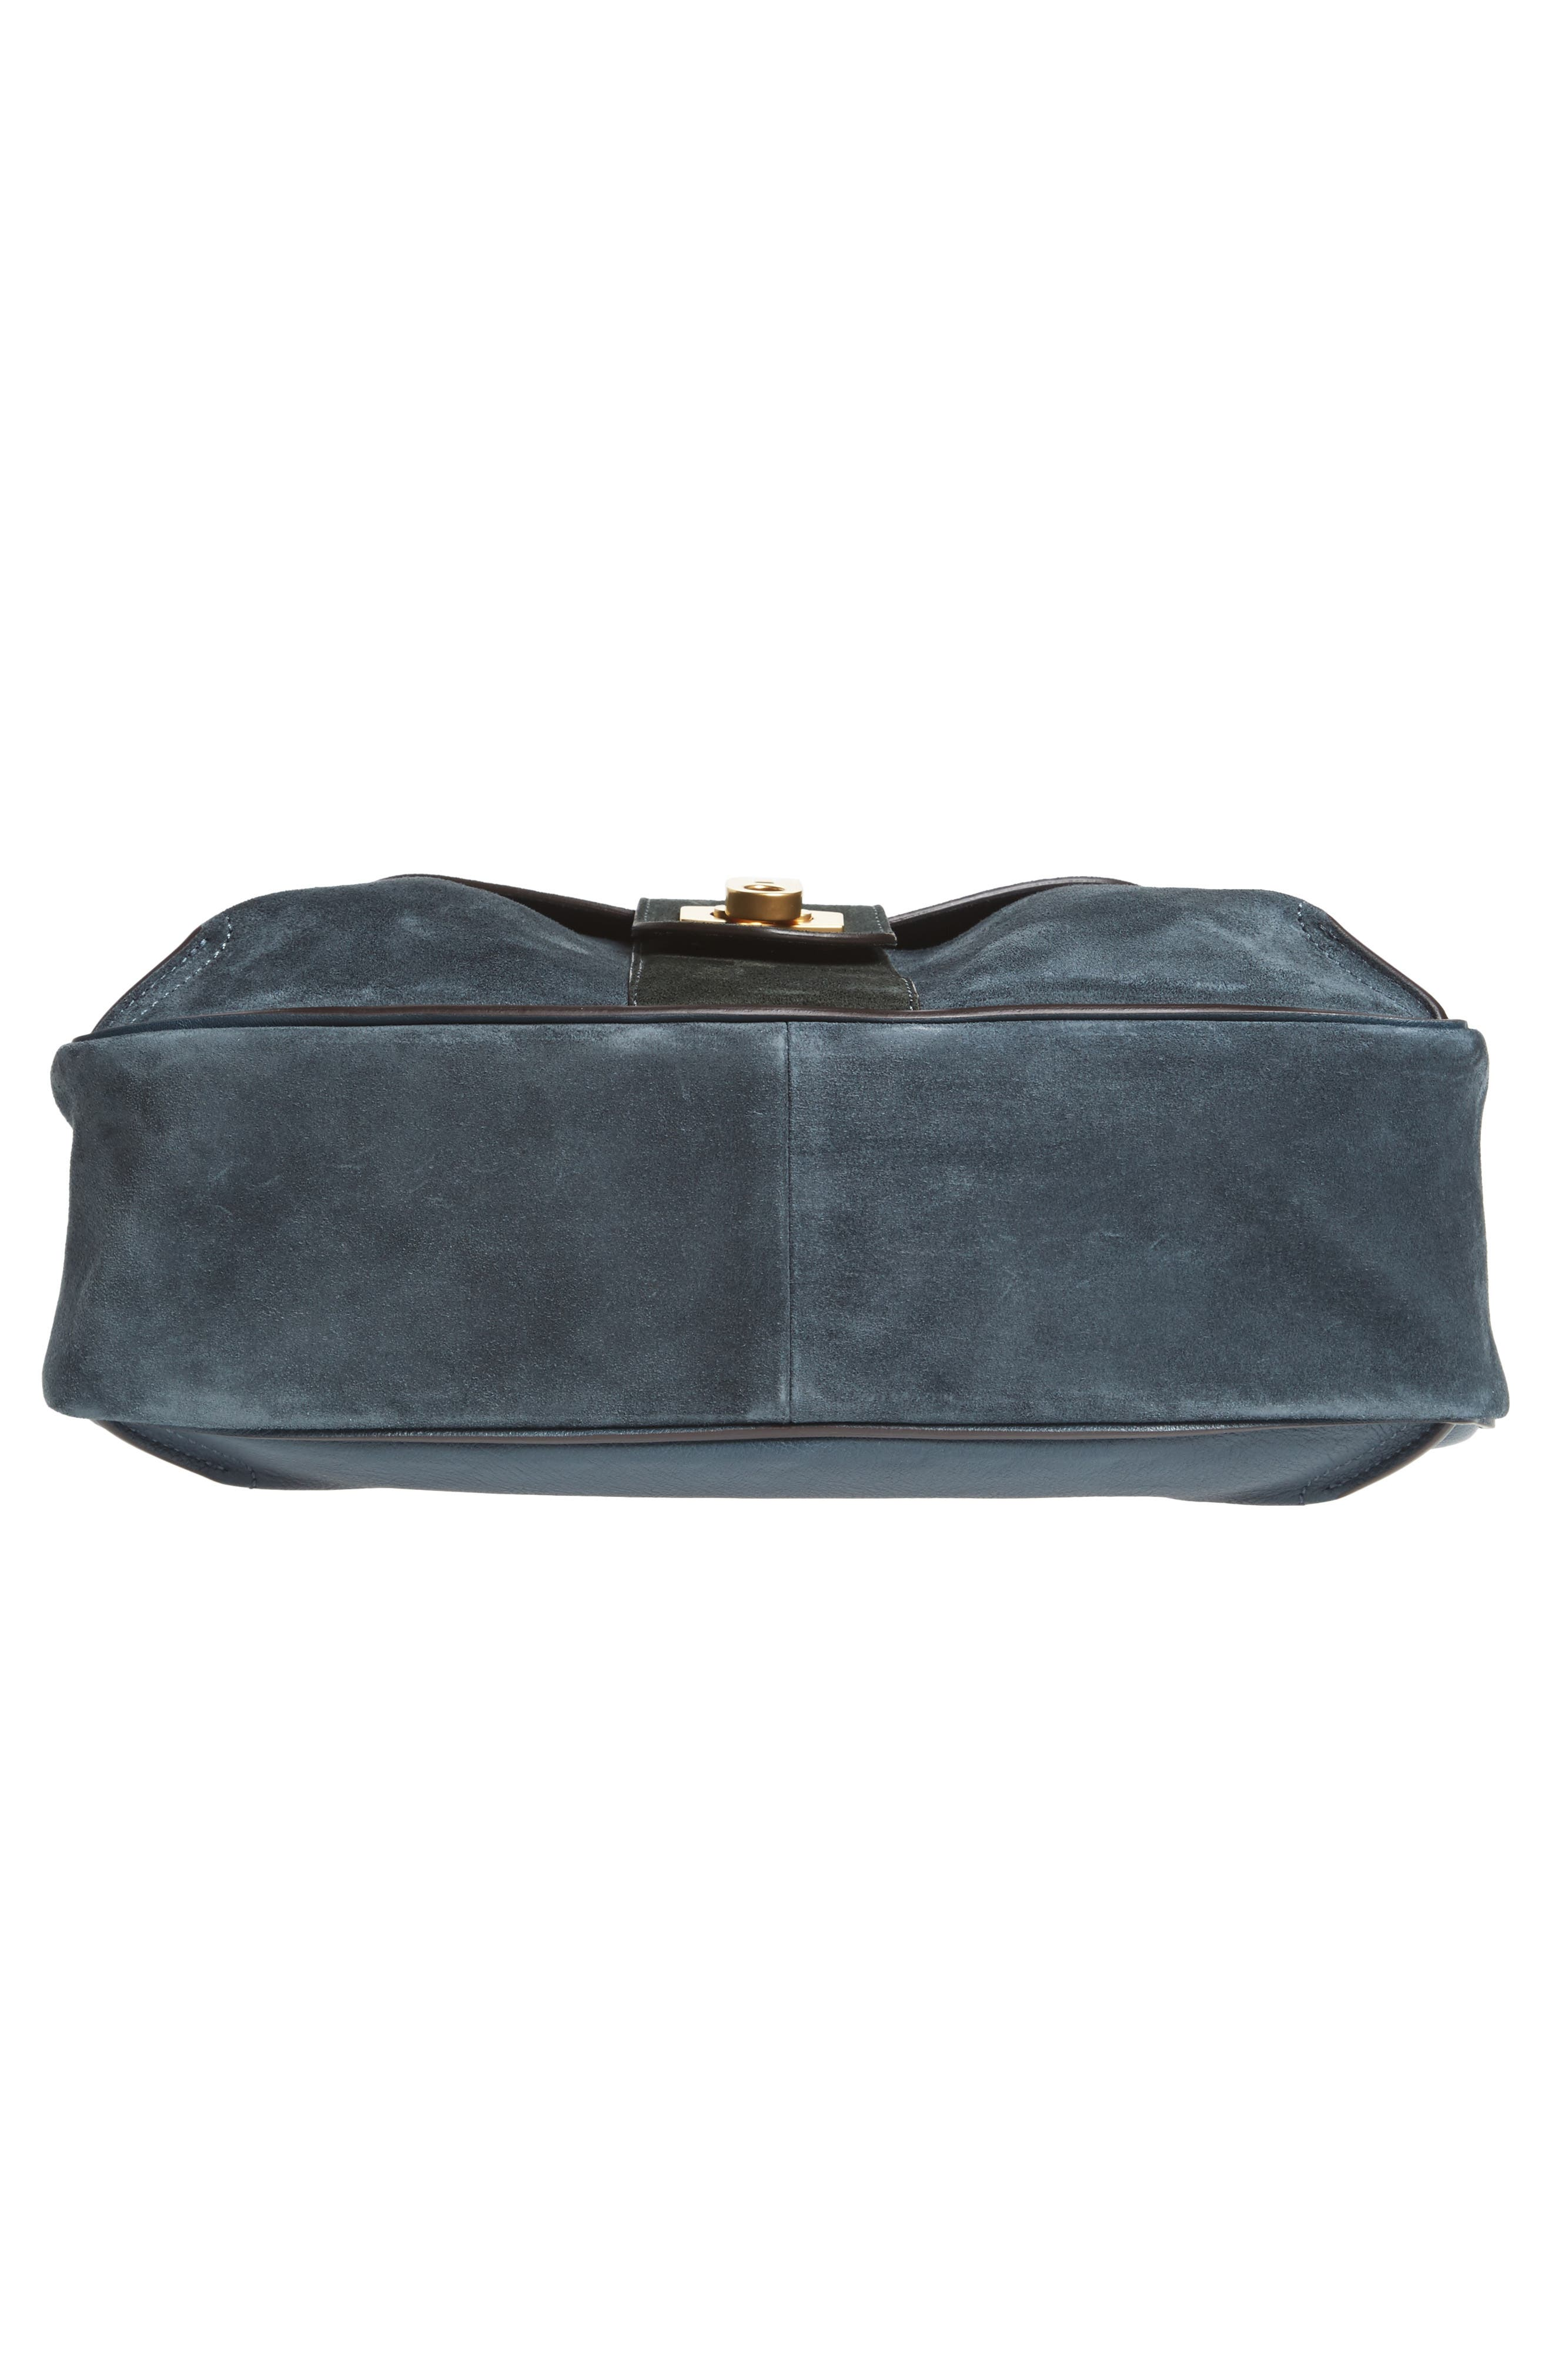 Medium Lexa Leather Shoulder Bag,                             Alternate thumbnail 10, color,